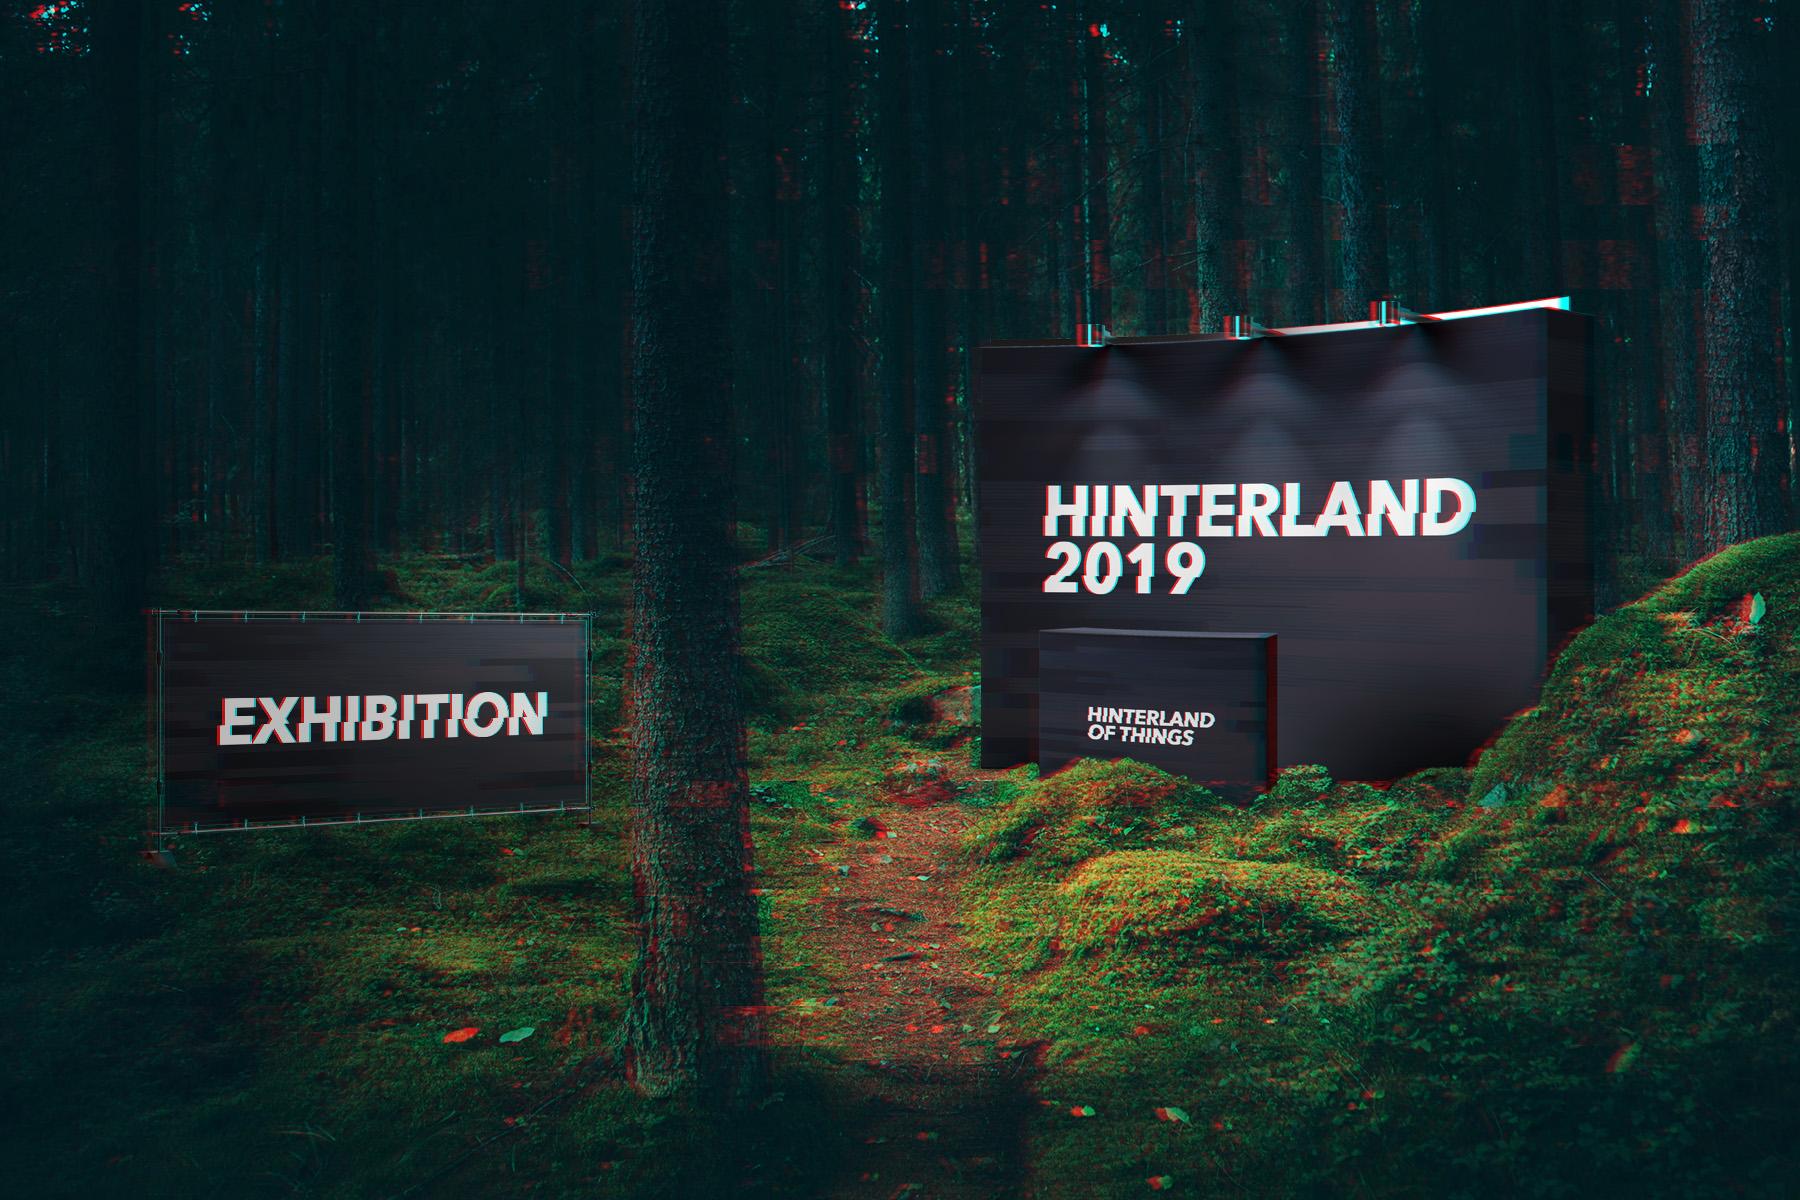 Hinterland Exhibition